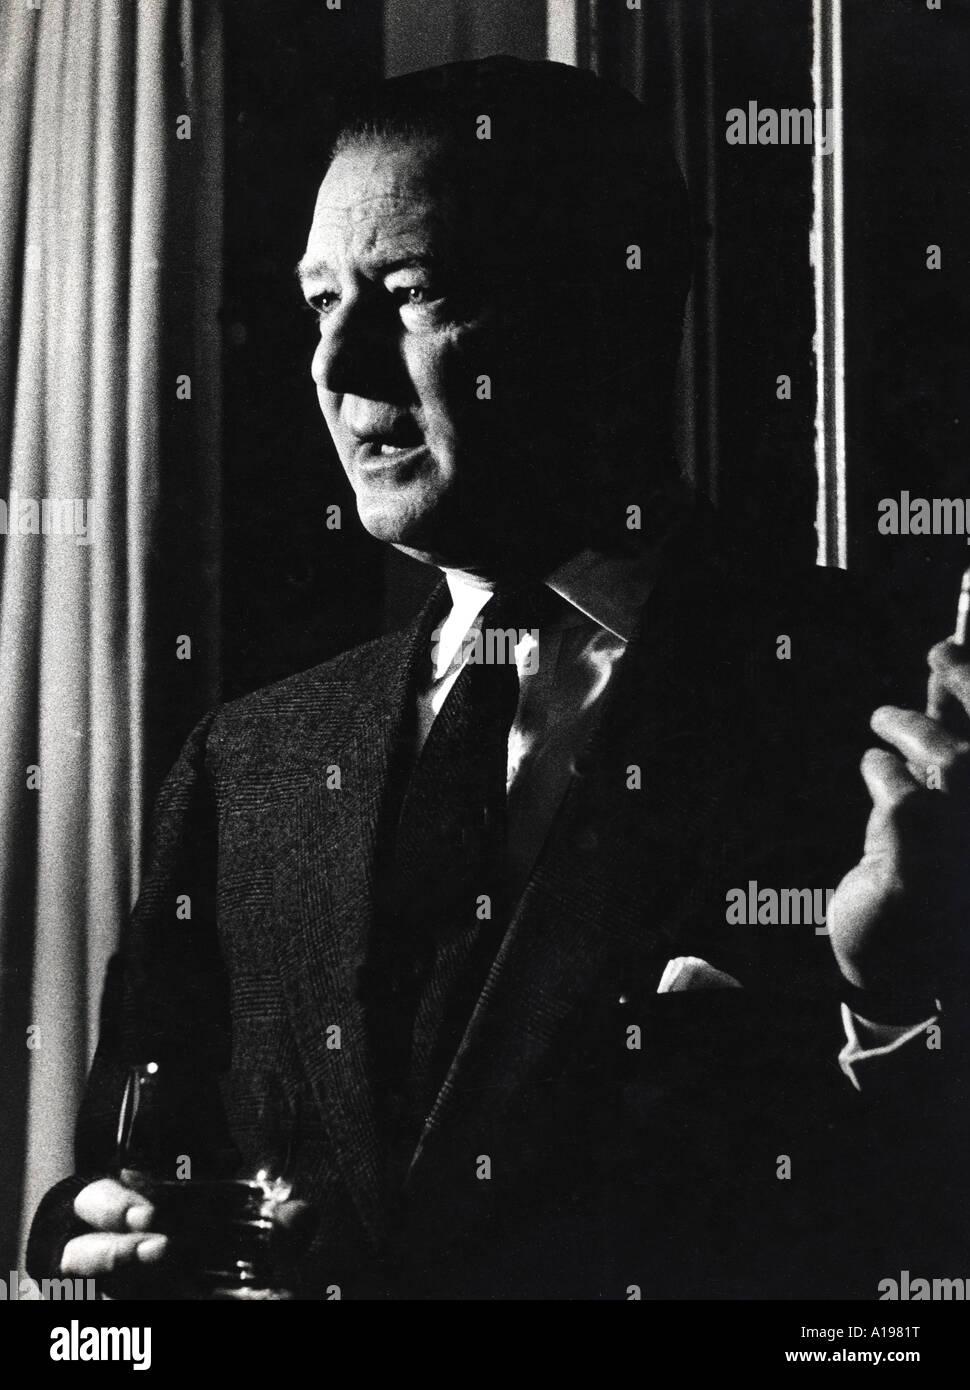 TERENCE RATTIGAN British playwright 1911 to 1977 - Stock Image